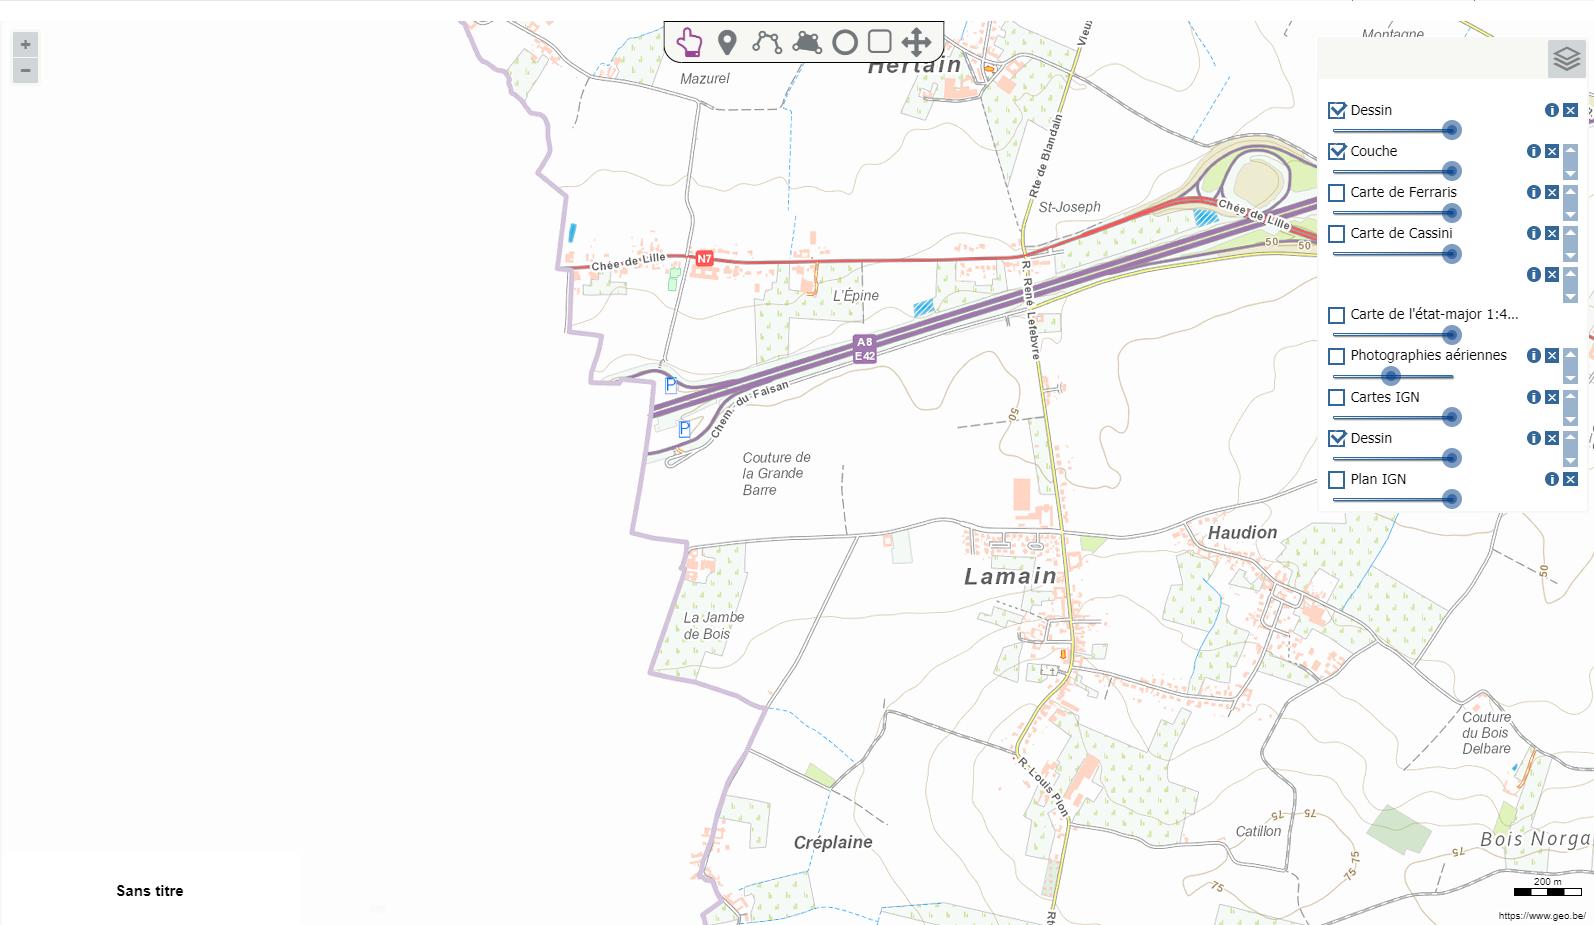 Carte topographique belge